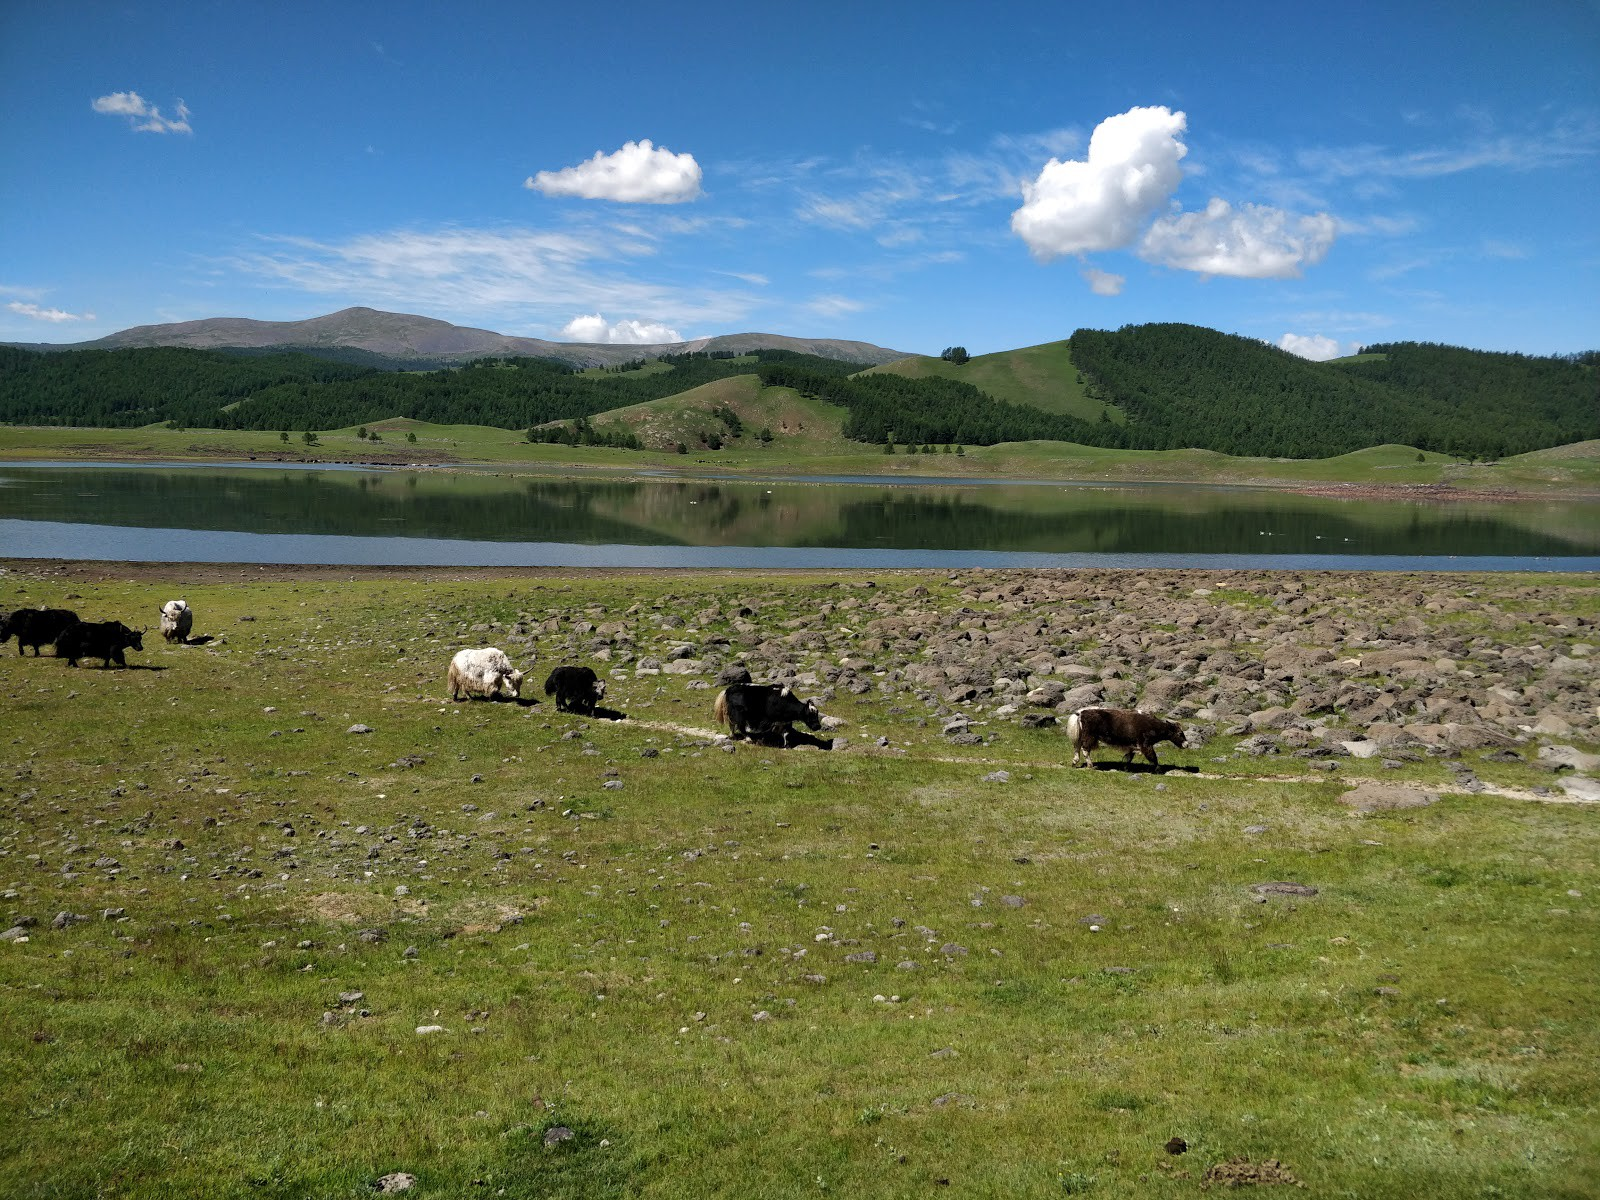 Mongolie paysage